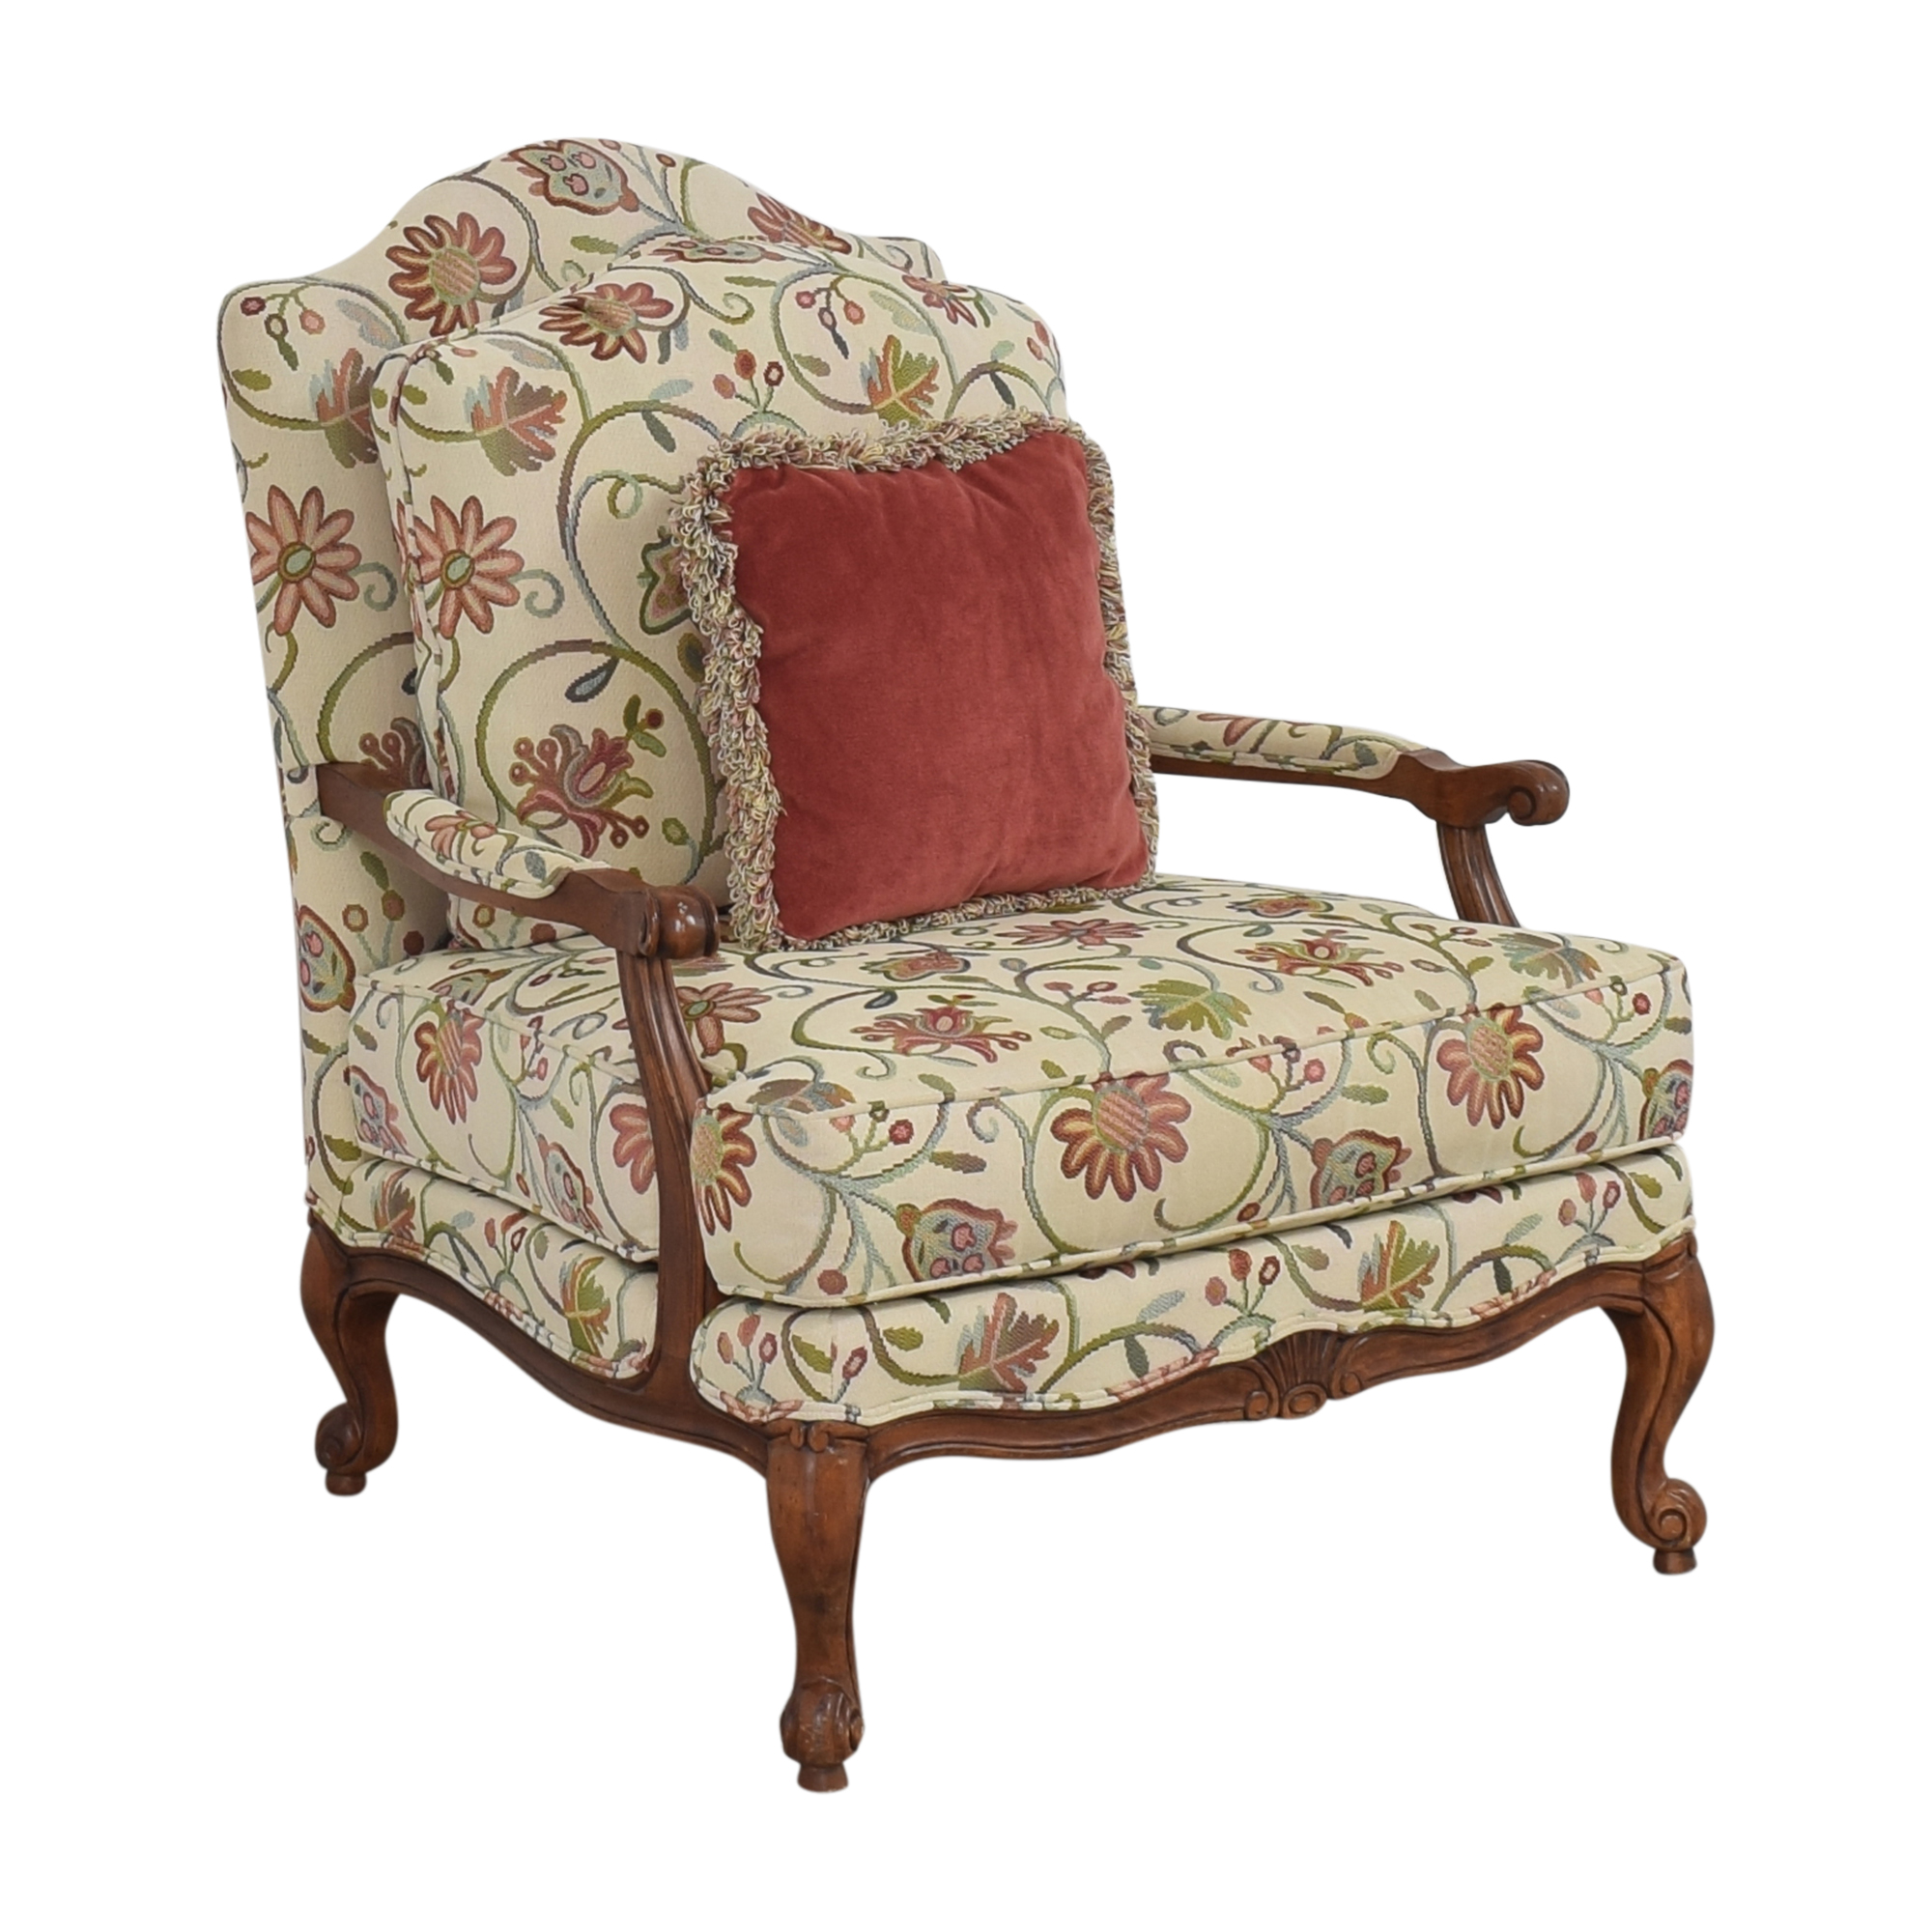 Ethan Allen Ethan Allen Harris Floral Chair pa